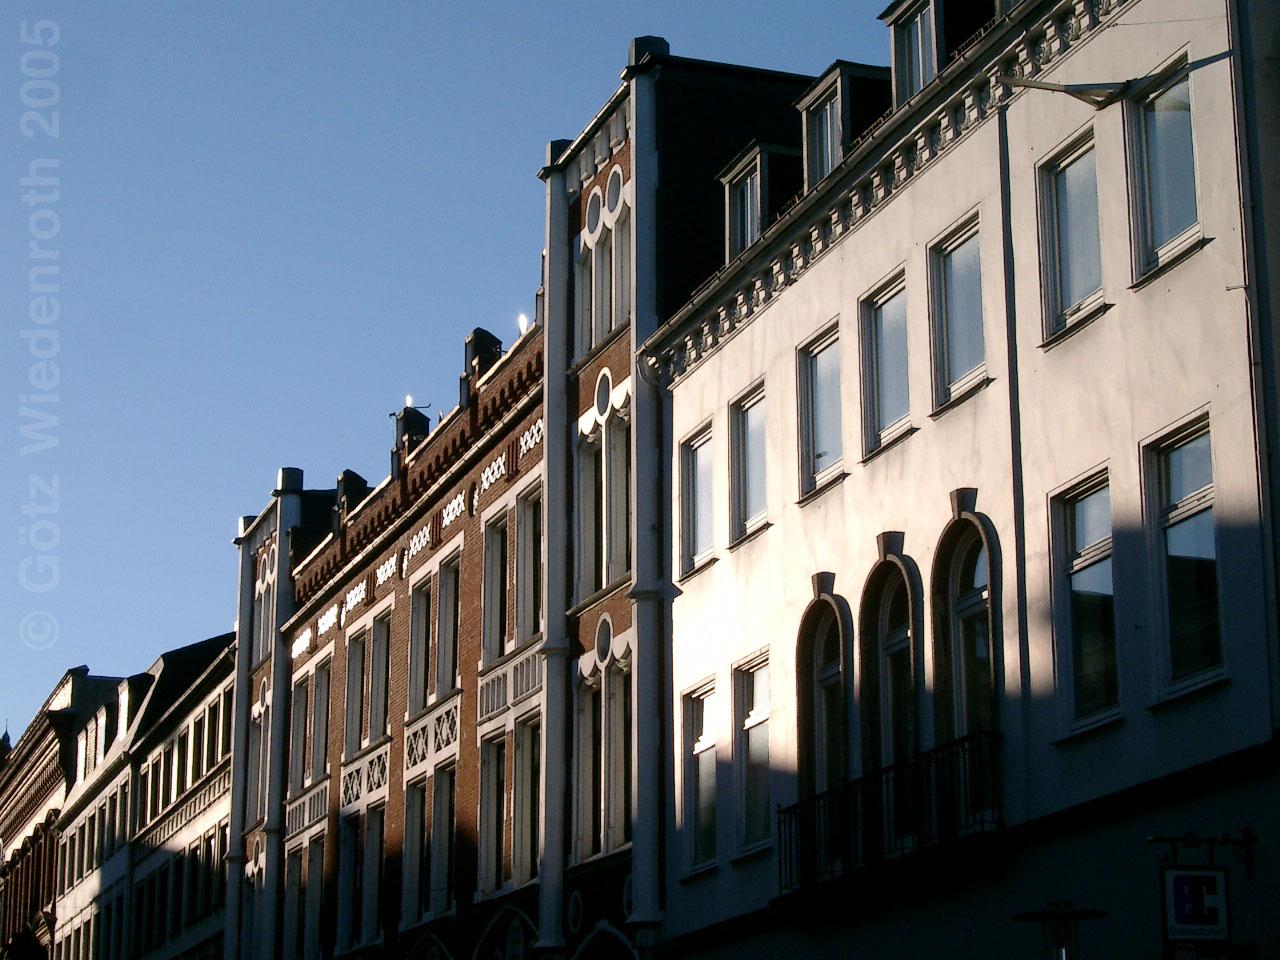 Rathausstra e bei sonntagswetter karikamur karikatur wiedenroth - Architektur flensburg ...